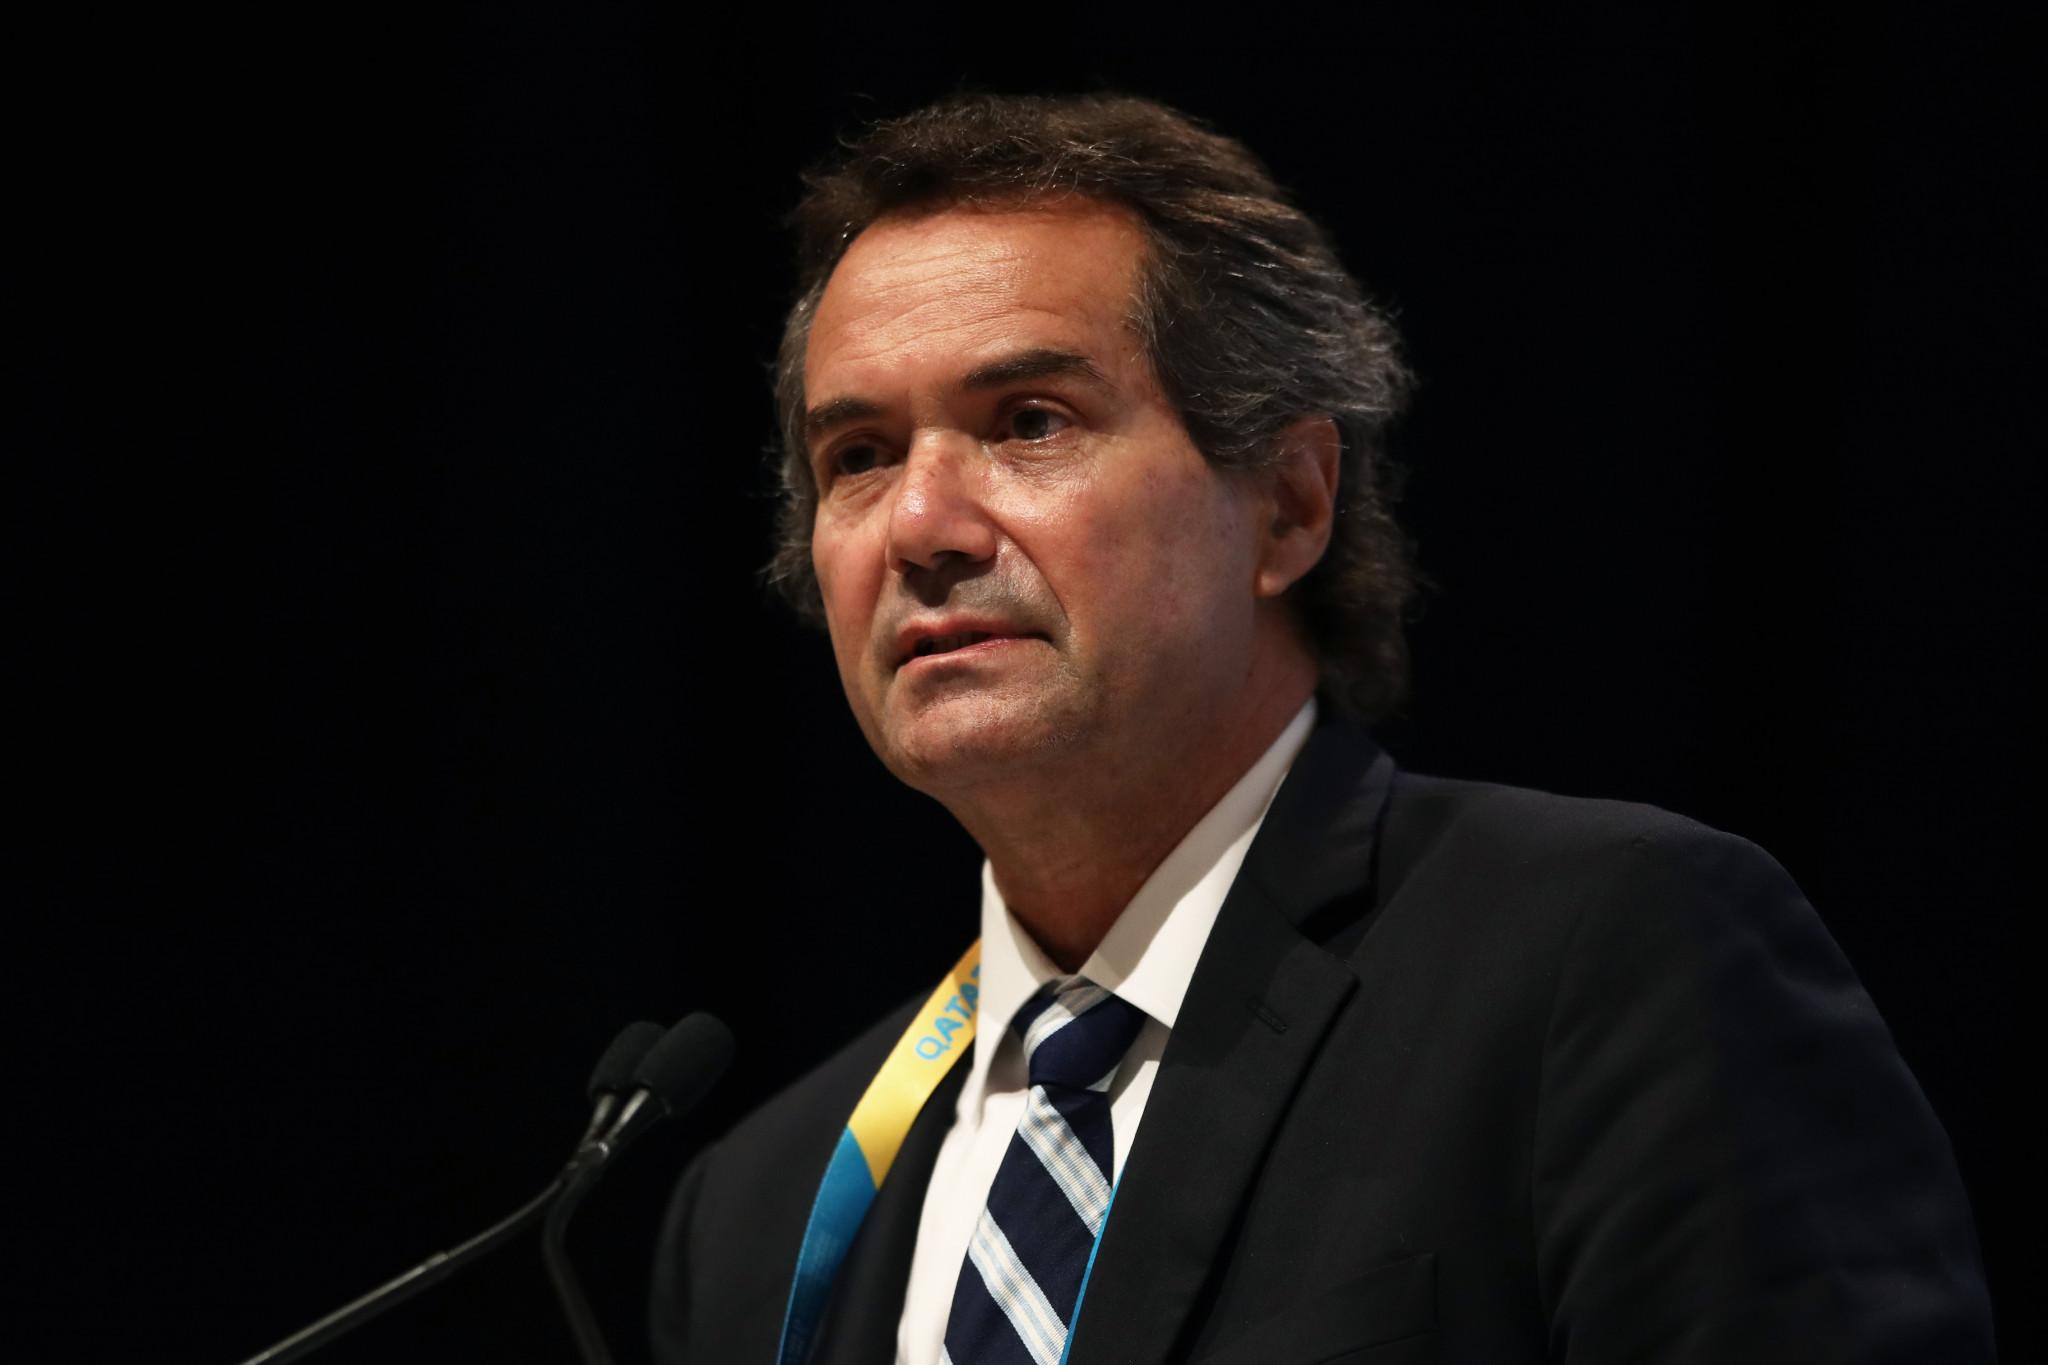 Panam Sports President Neven Ilic said it was an